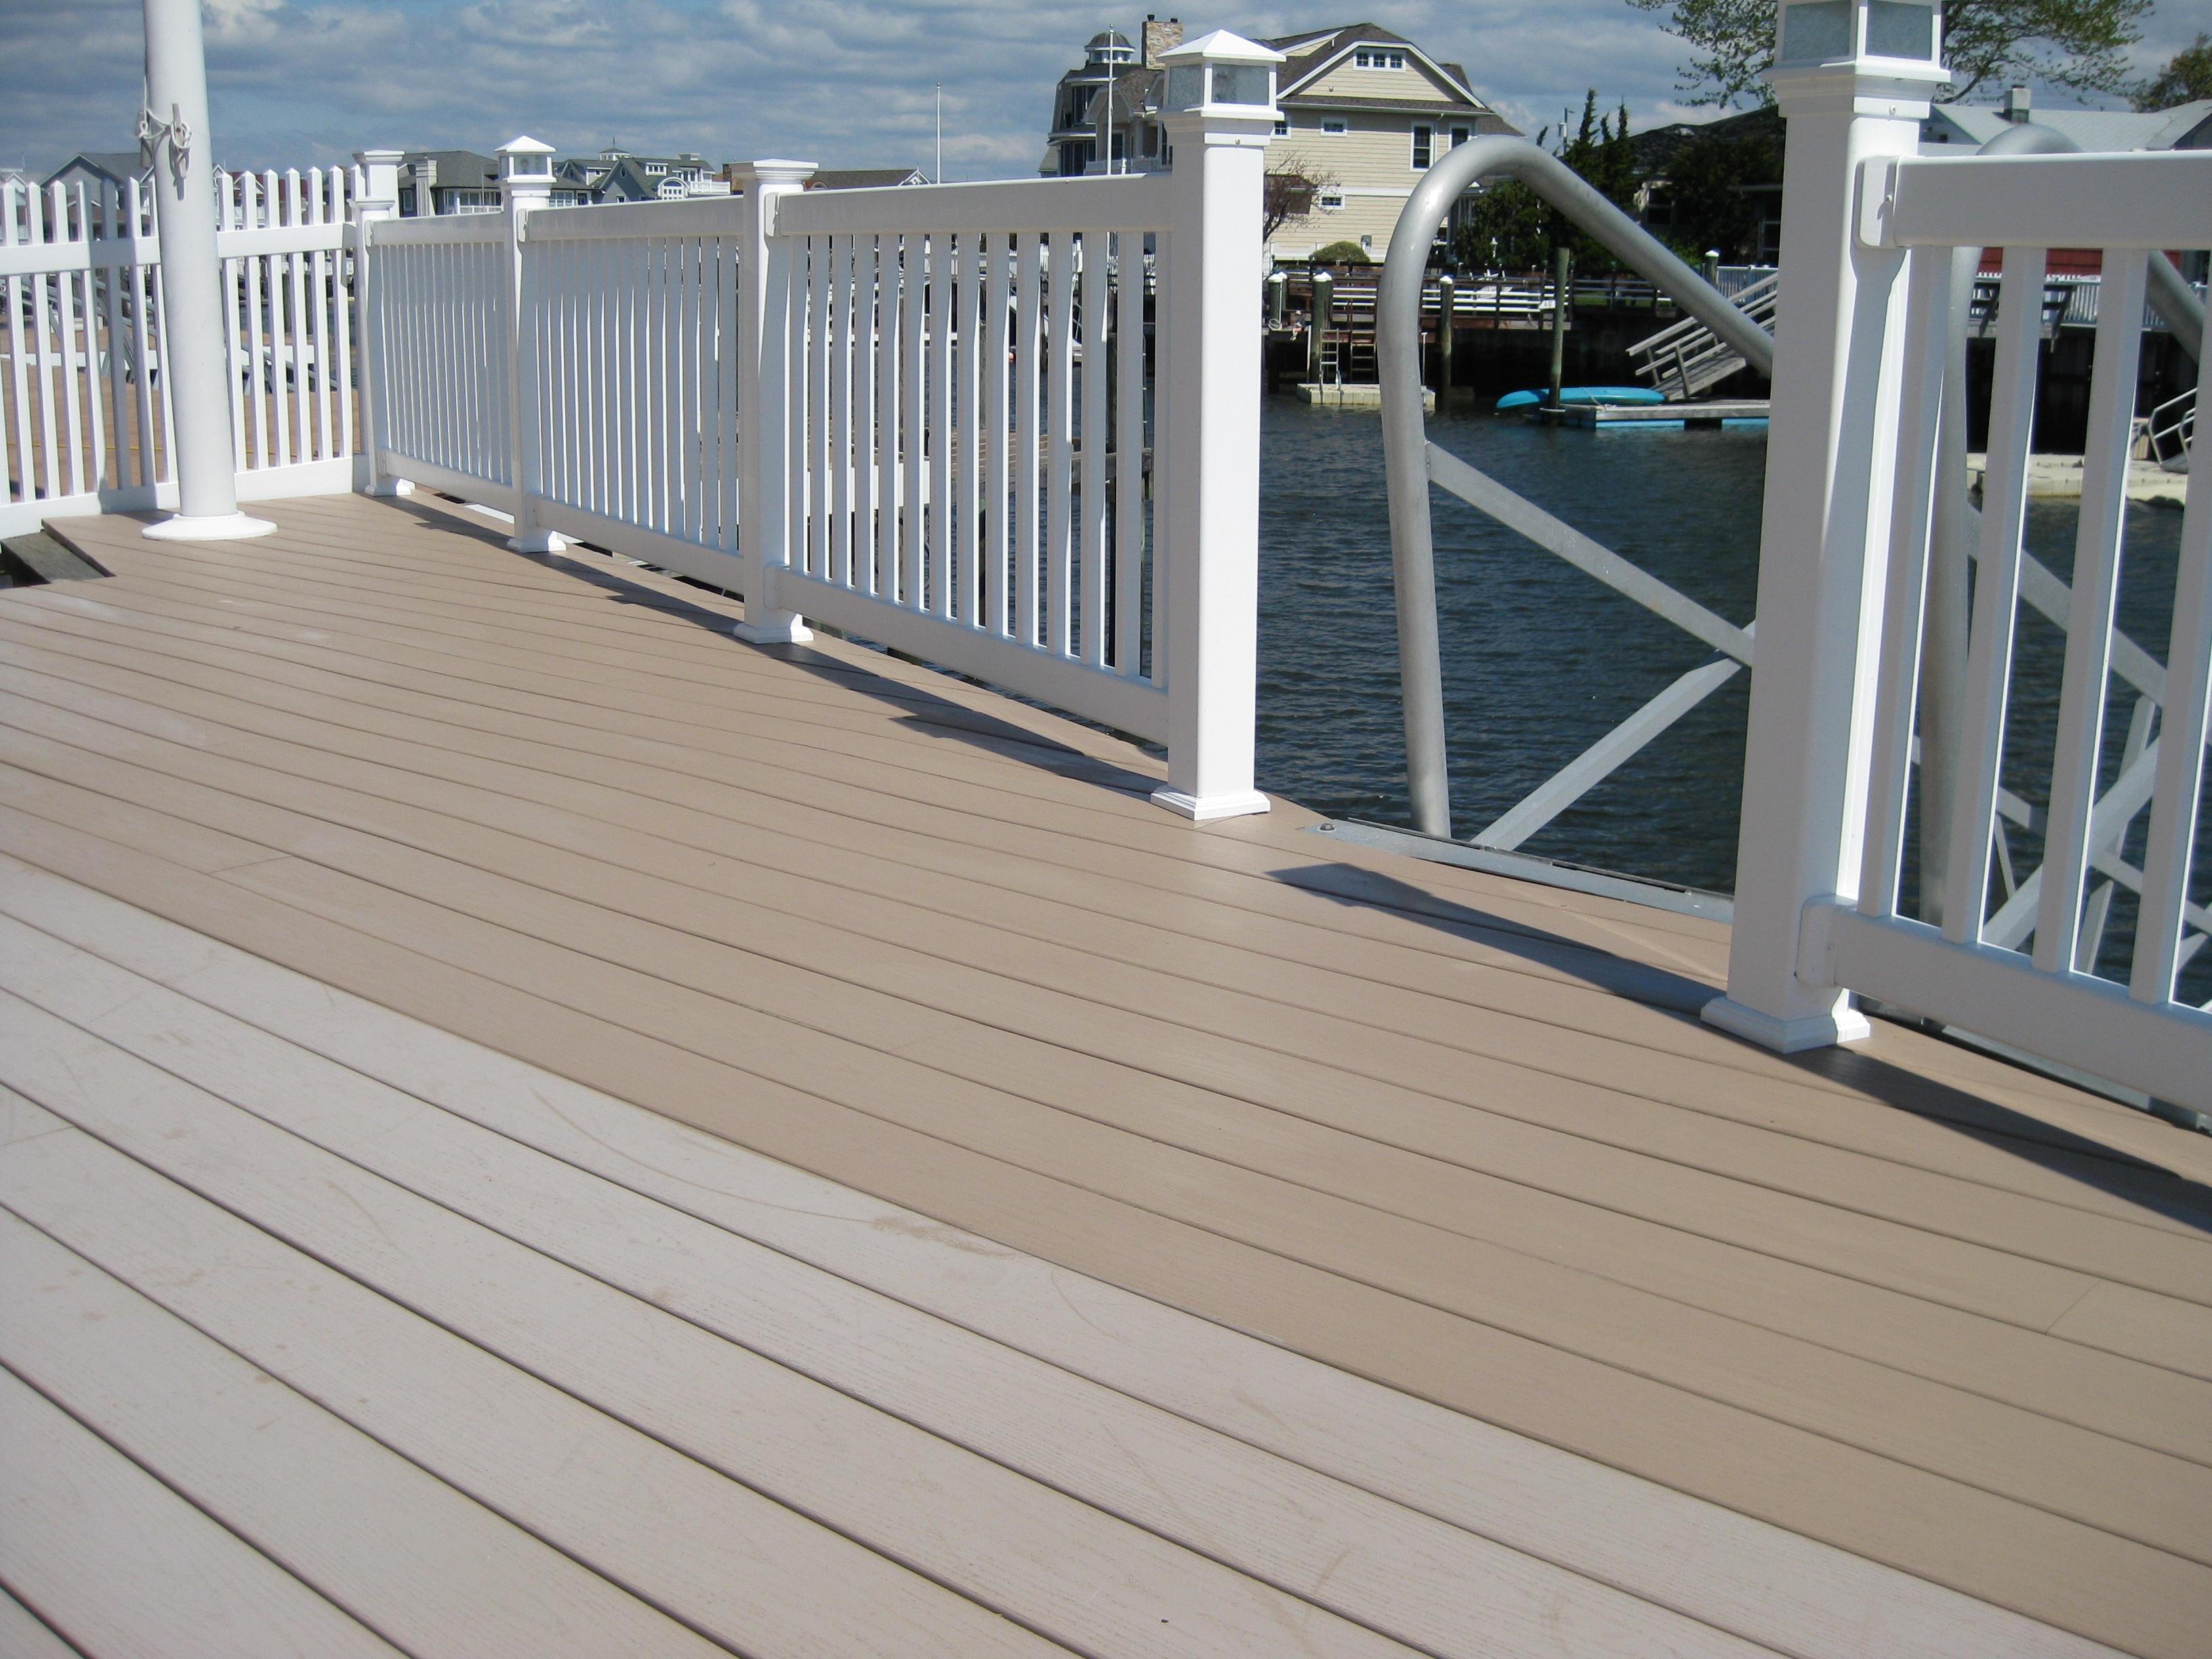 Clean weathered deck